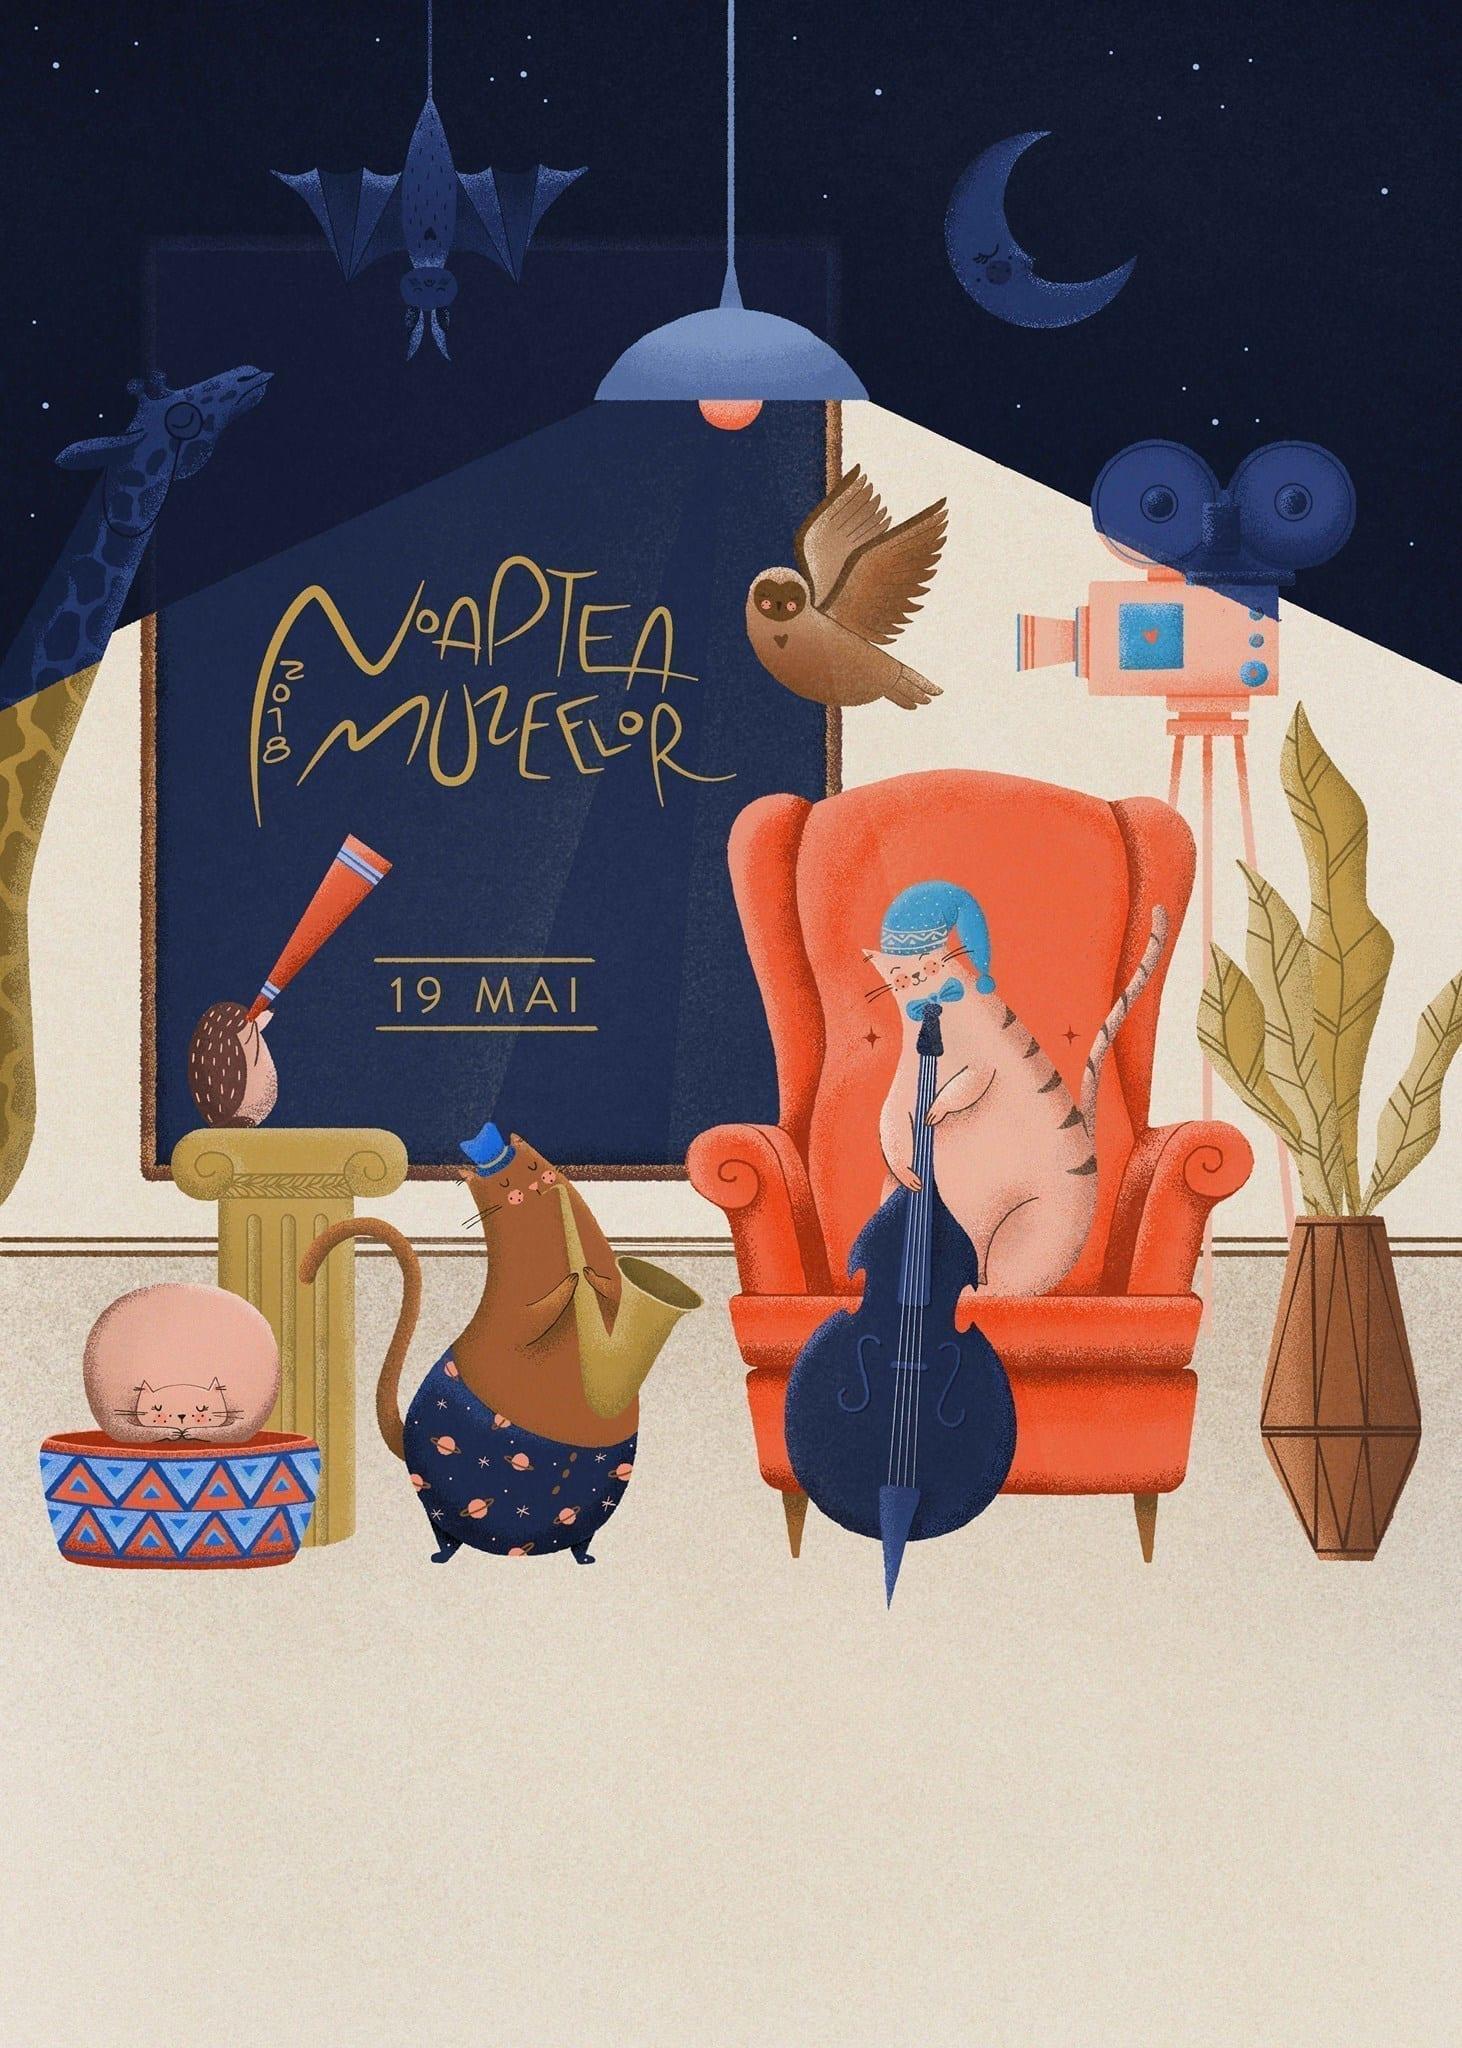 Noaptea Muzeelor 2018 ilustratie realizat de Mura